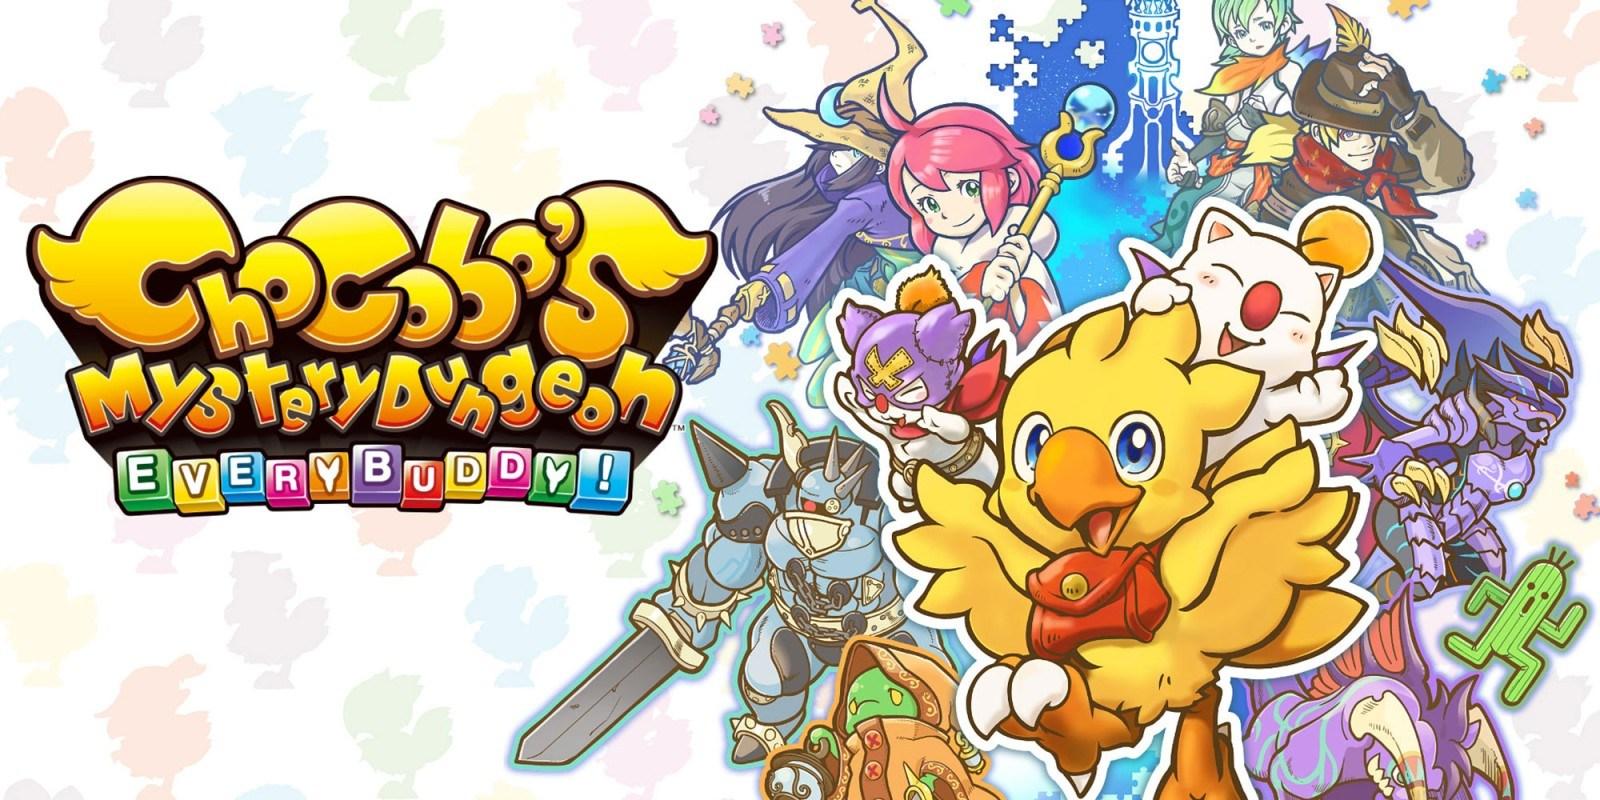 Chocobo's Mystery Dungeon: Everybuddy uscirà il 20 Marzo!